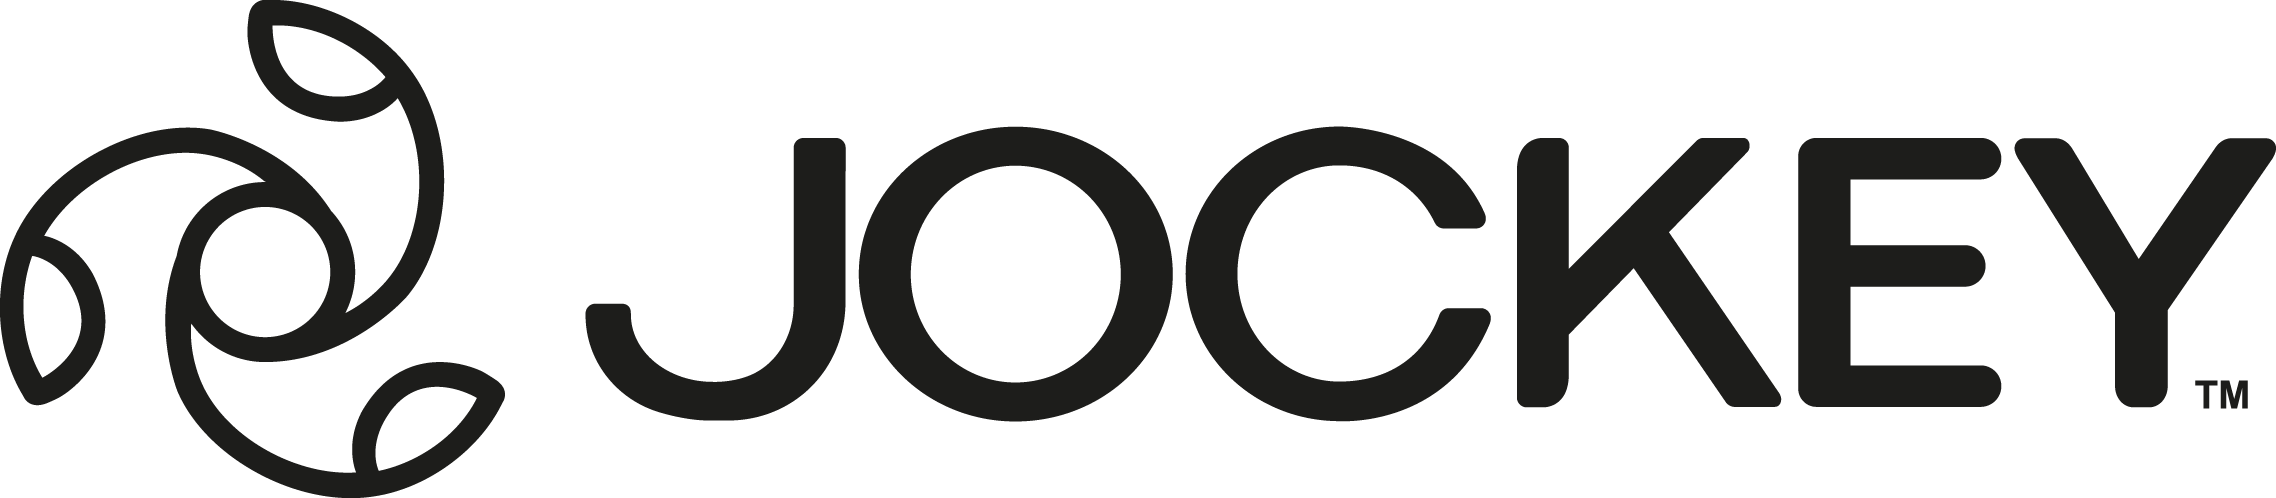 Jockey Logo png